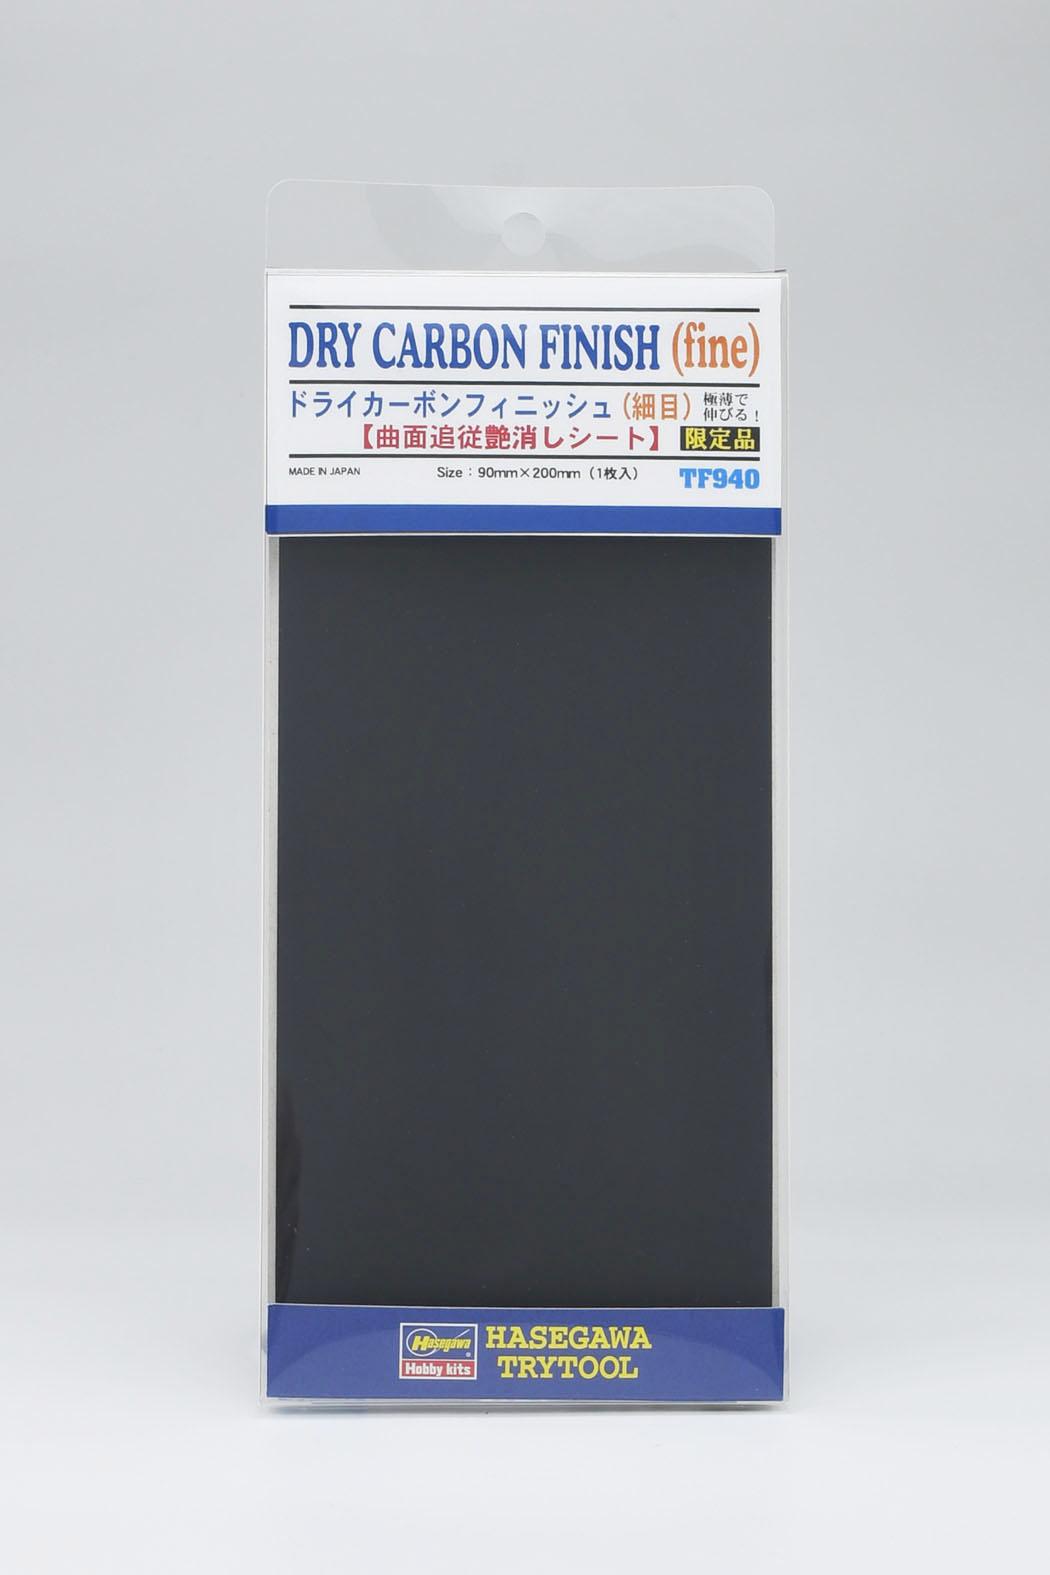 Hasegawa DRY CARBON FINISH (FINE) (size: 90mm x 200mm) (TF940)